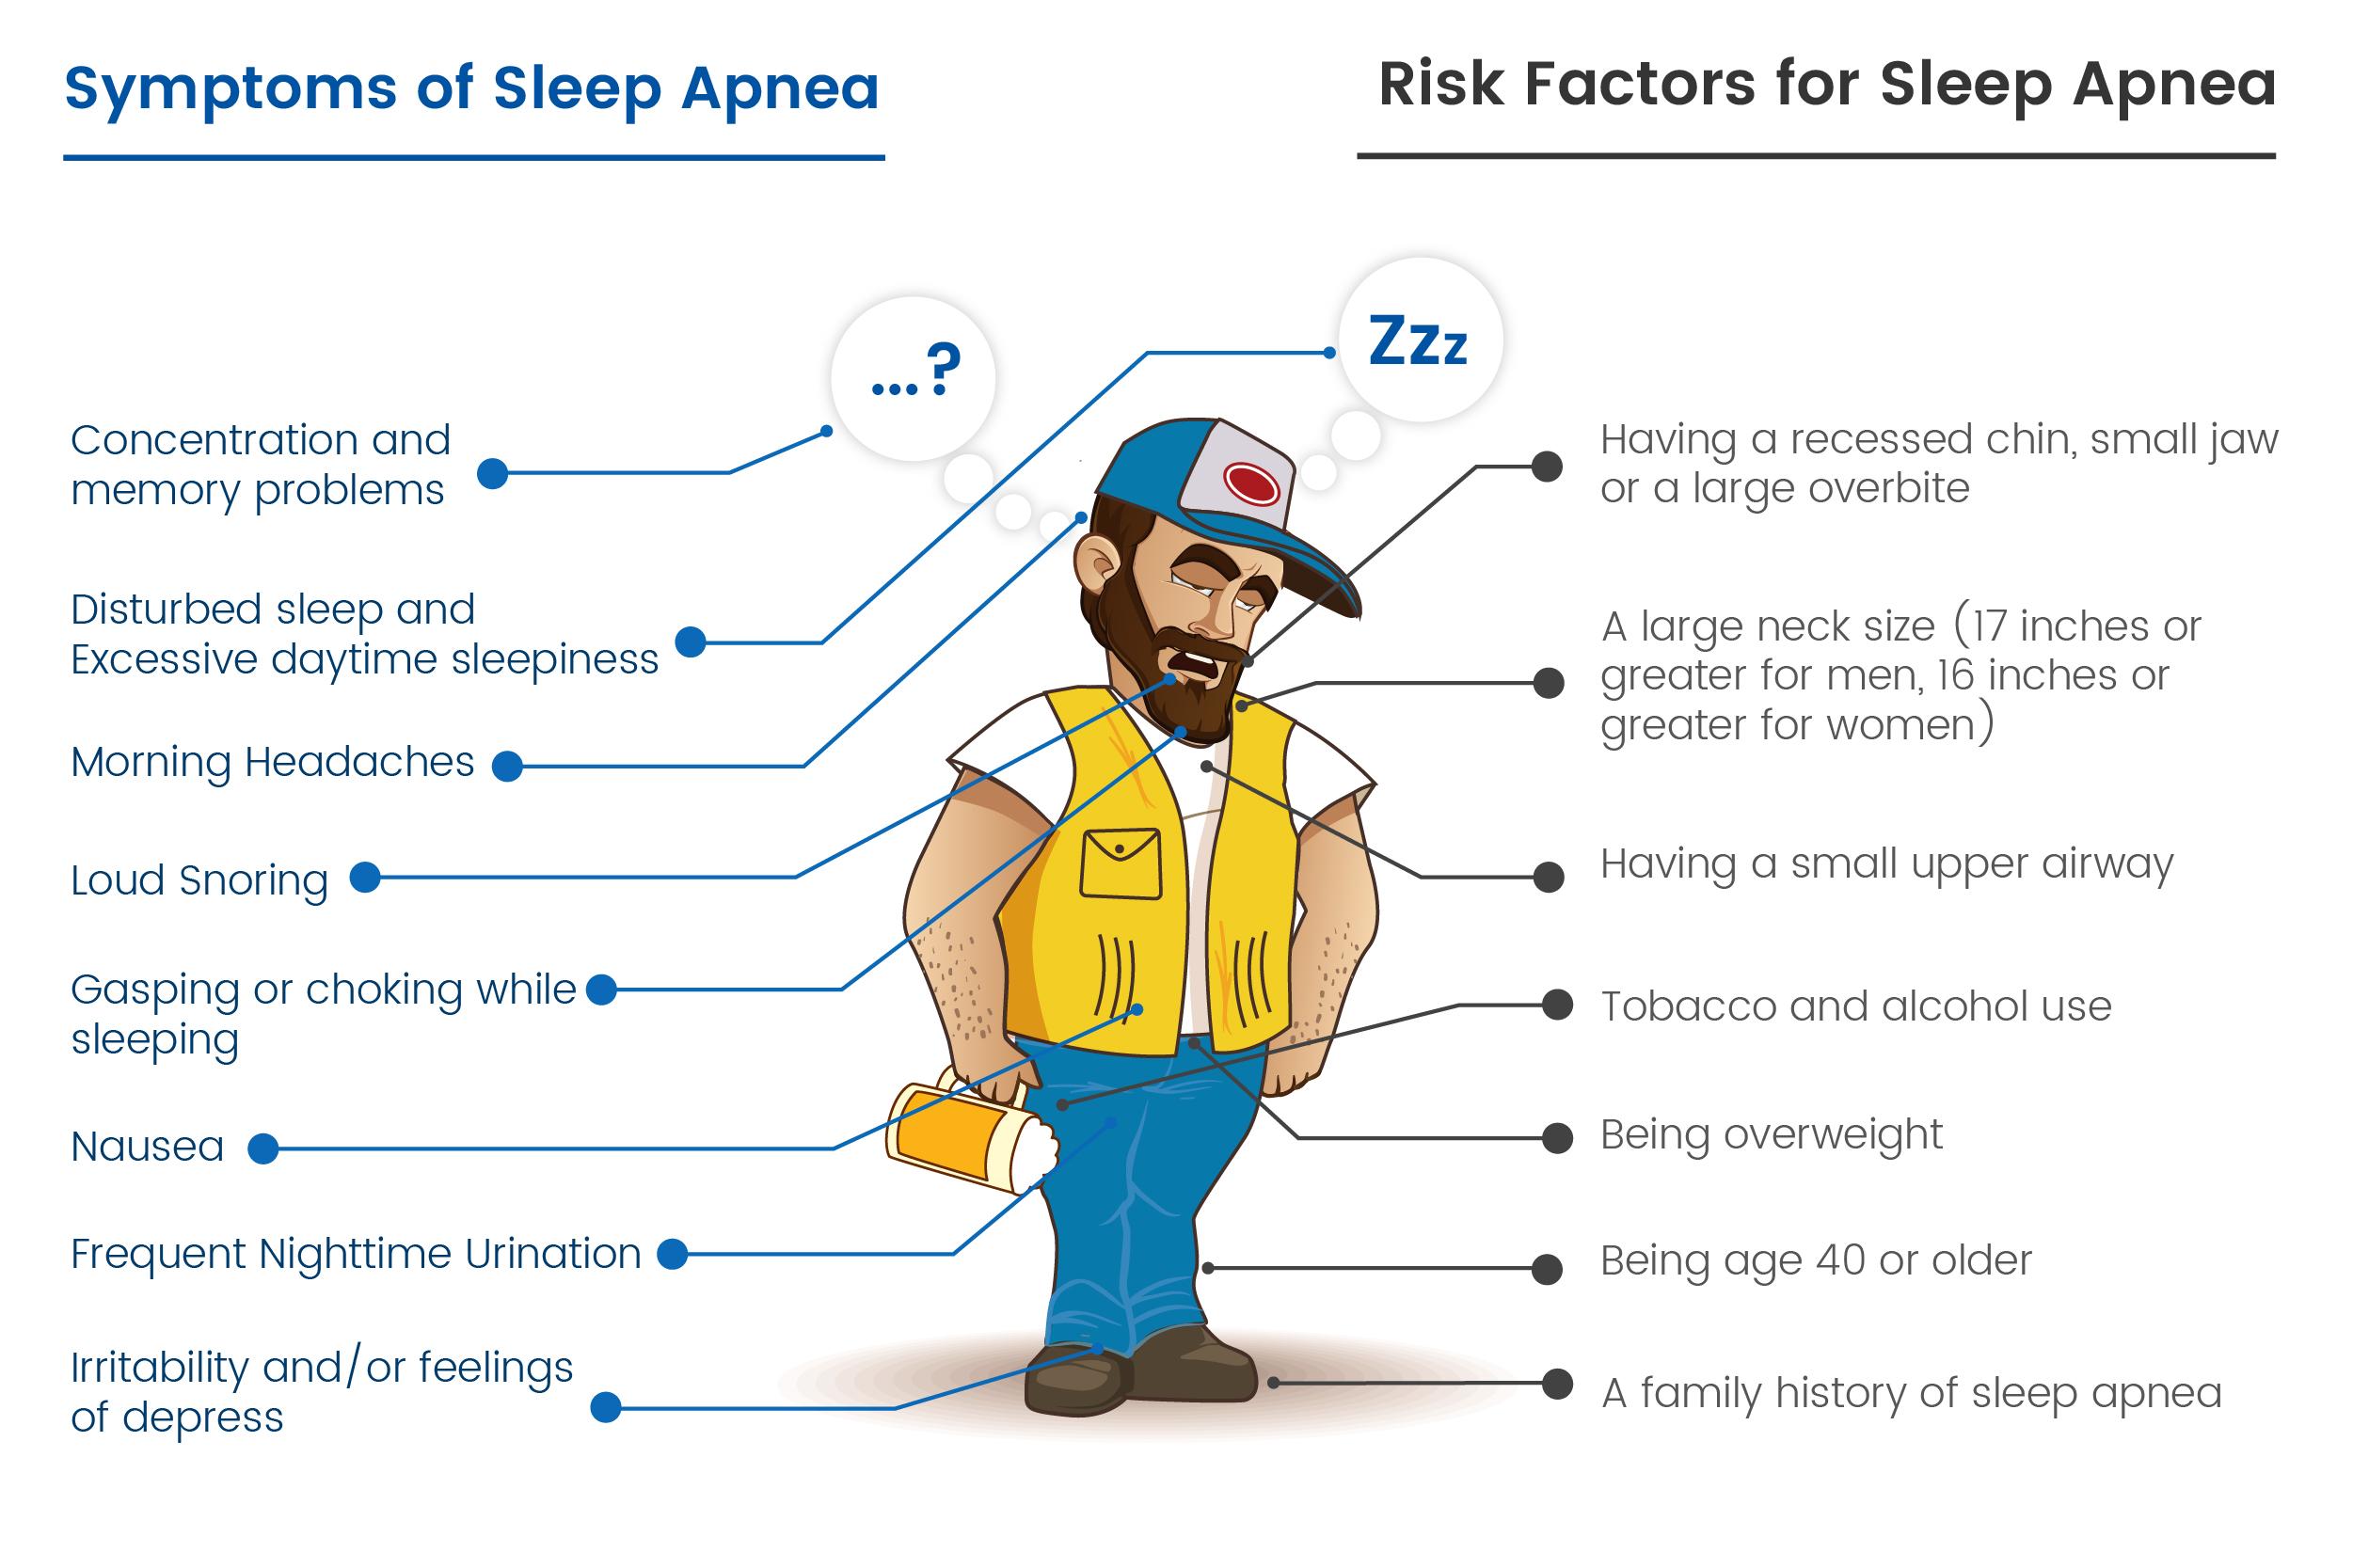 Symptoms and Risks of Sleep Apnea